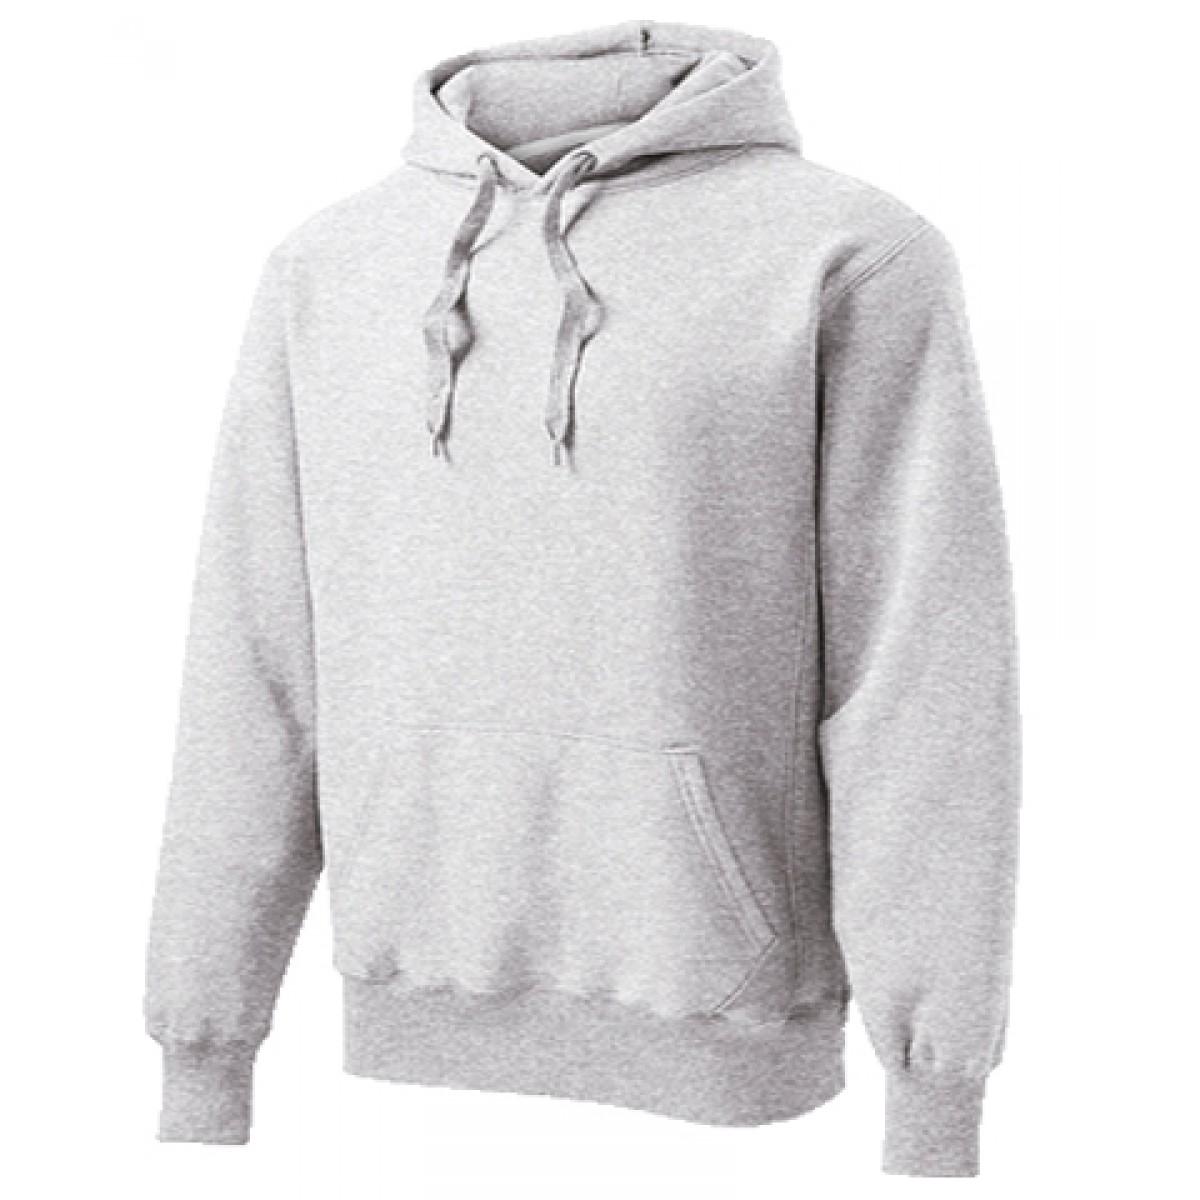 Hooded Sweatshirt 50/50 Heavy Blend Gray-Gray -XL